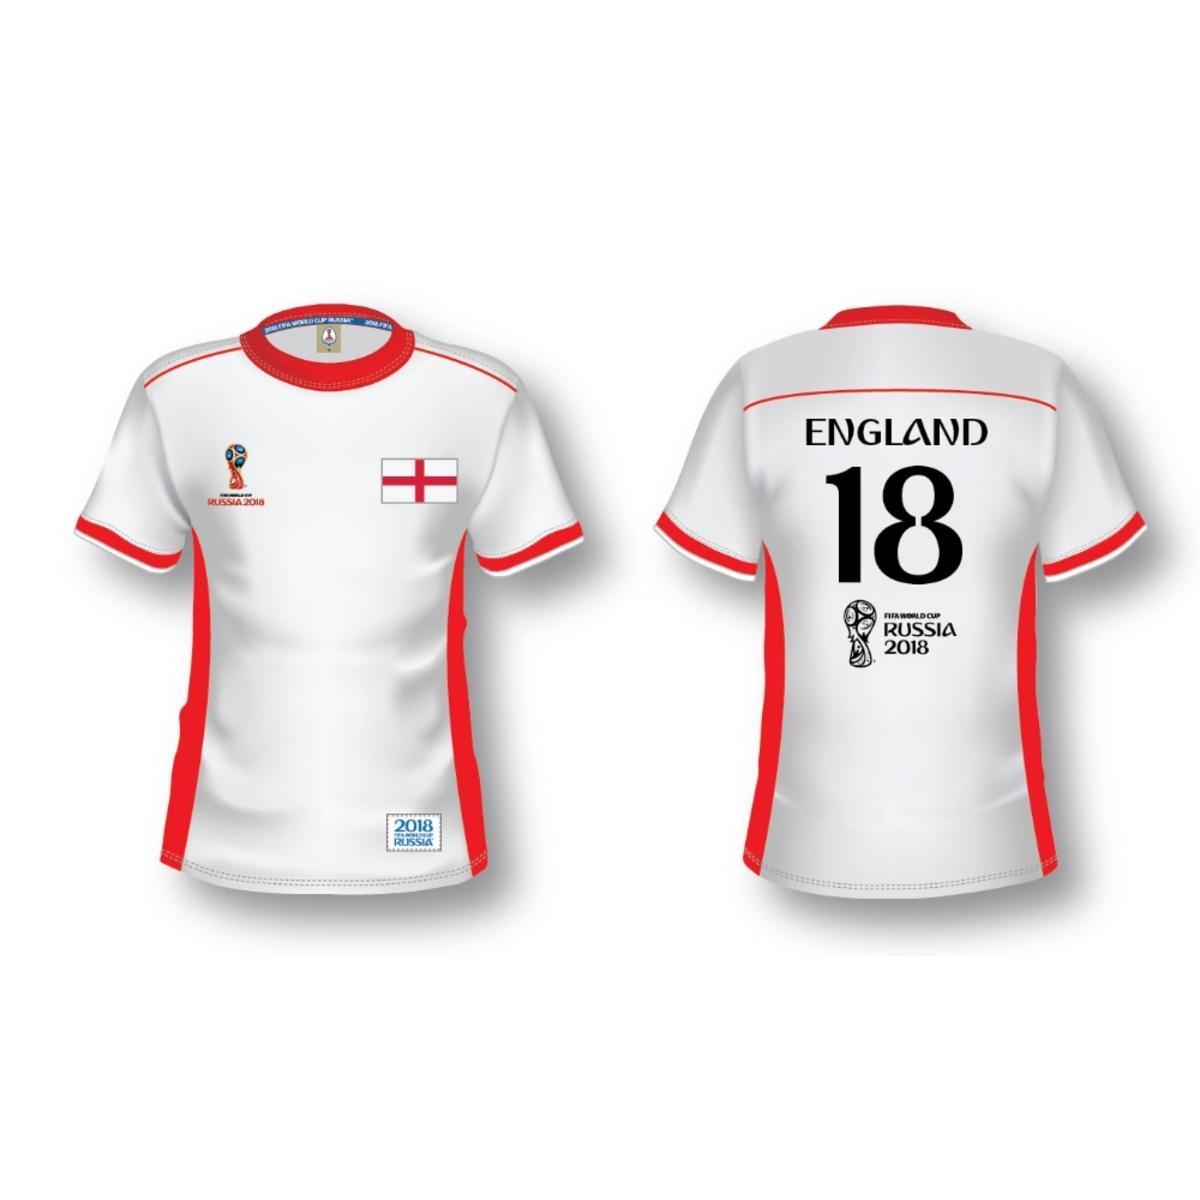 Beautiful England Jersey World Cup 2018 - 20053198_02_1200  Graphic_635184 .jpg